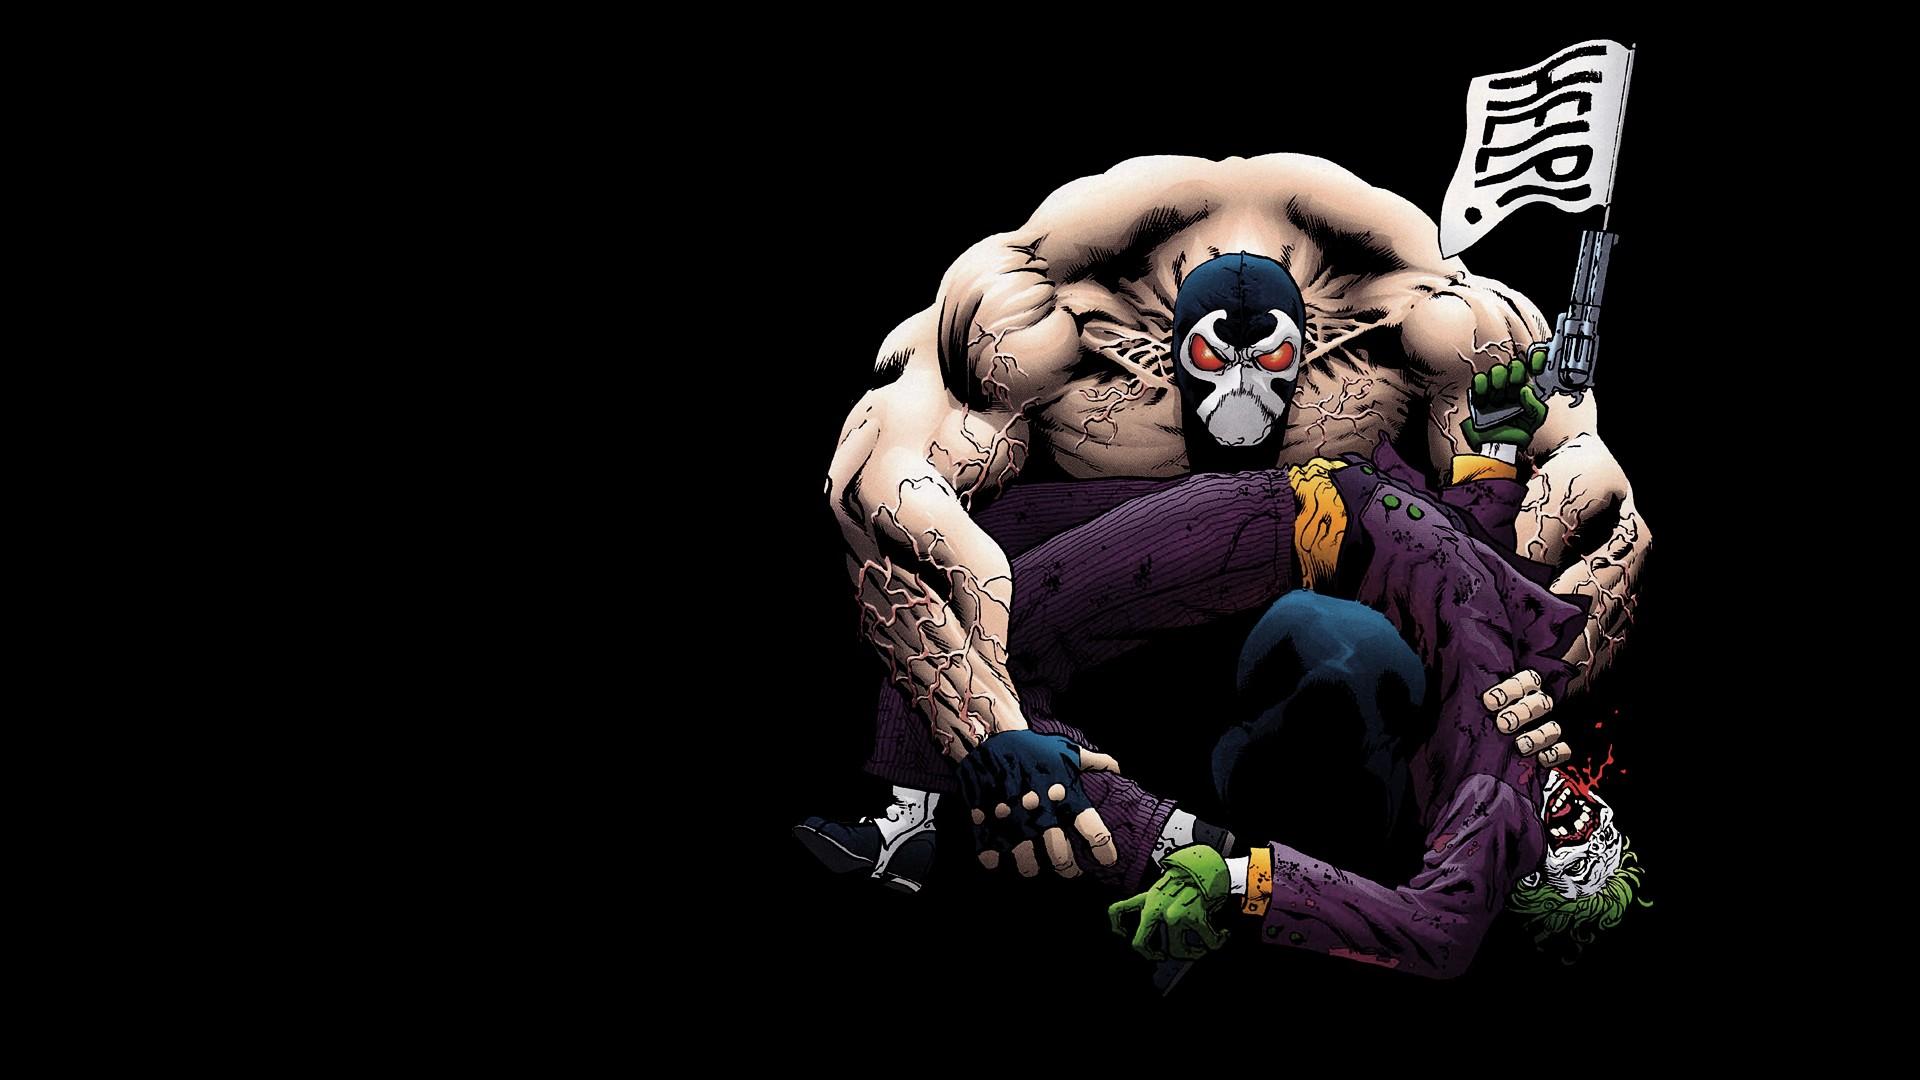 [48+] The Joker Wallpaper 1080p on WallpaperSafari